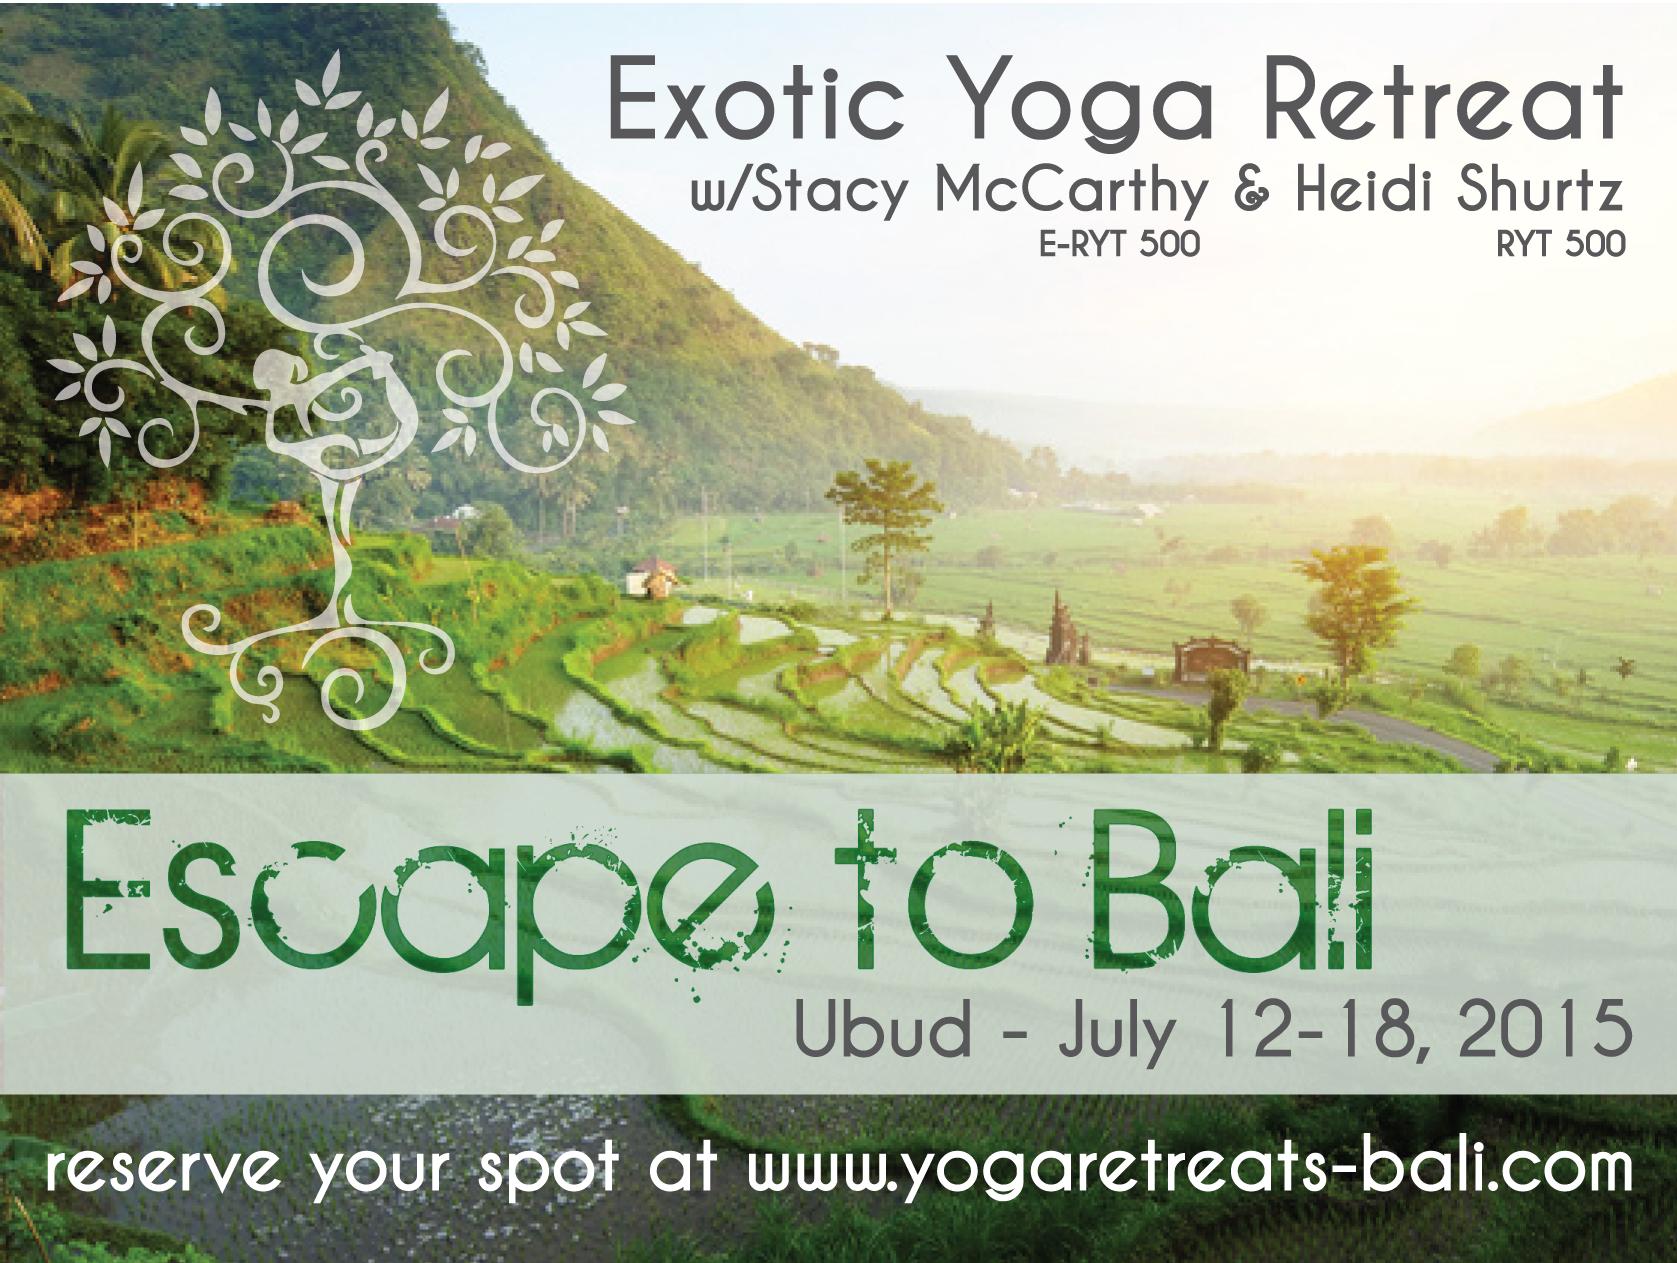 yoga postcard2015-01-02